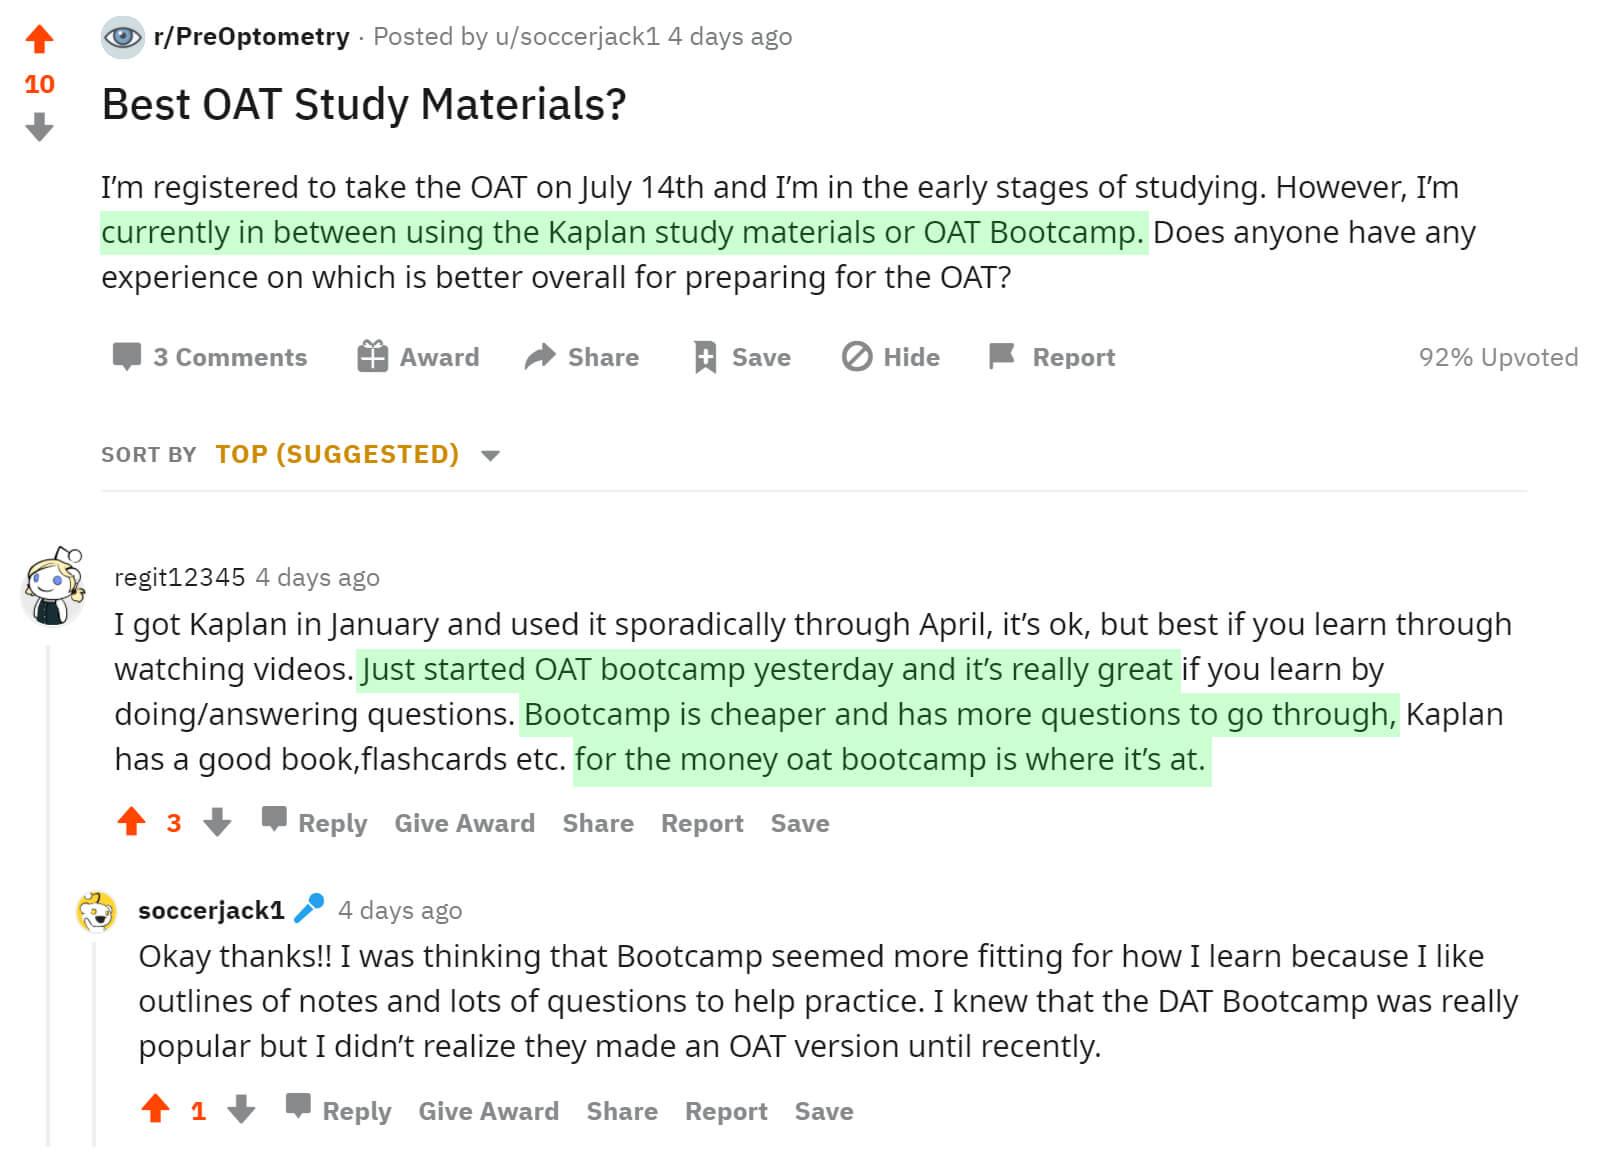 OAT Bootcamp vs. Kaplan